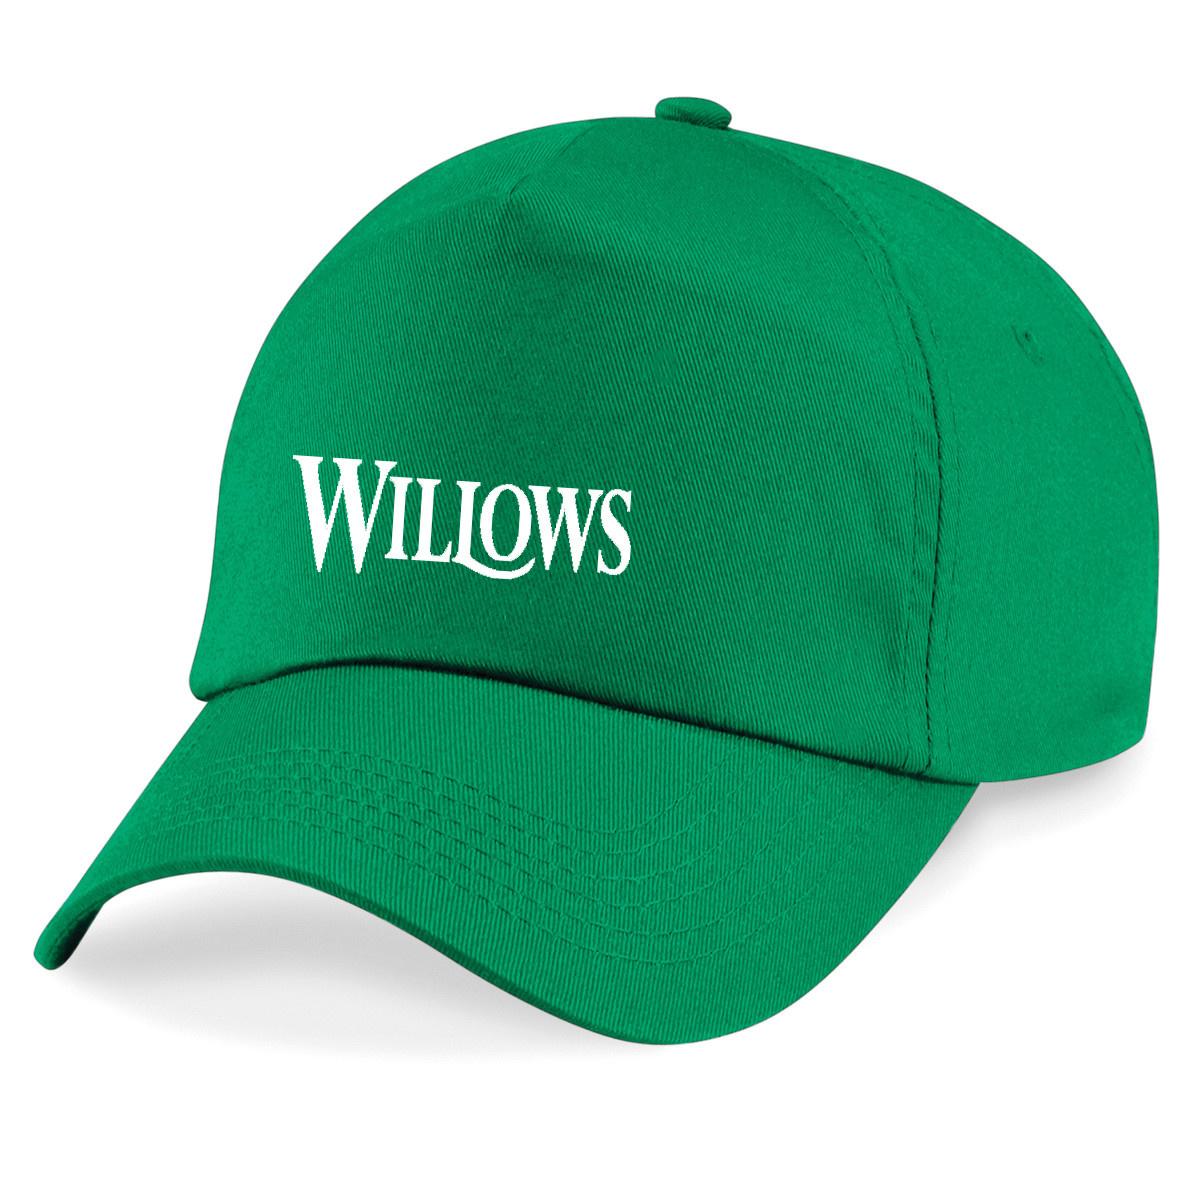 Willows Farm Adults Original Cap